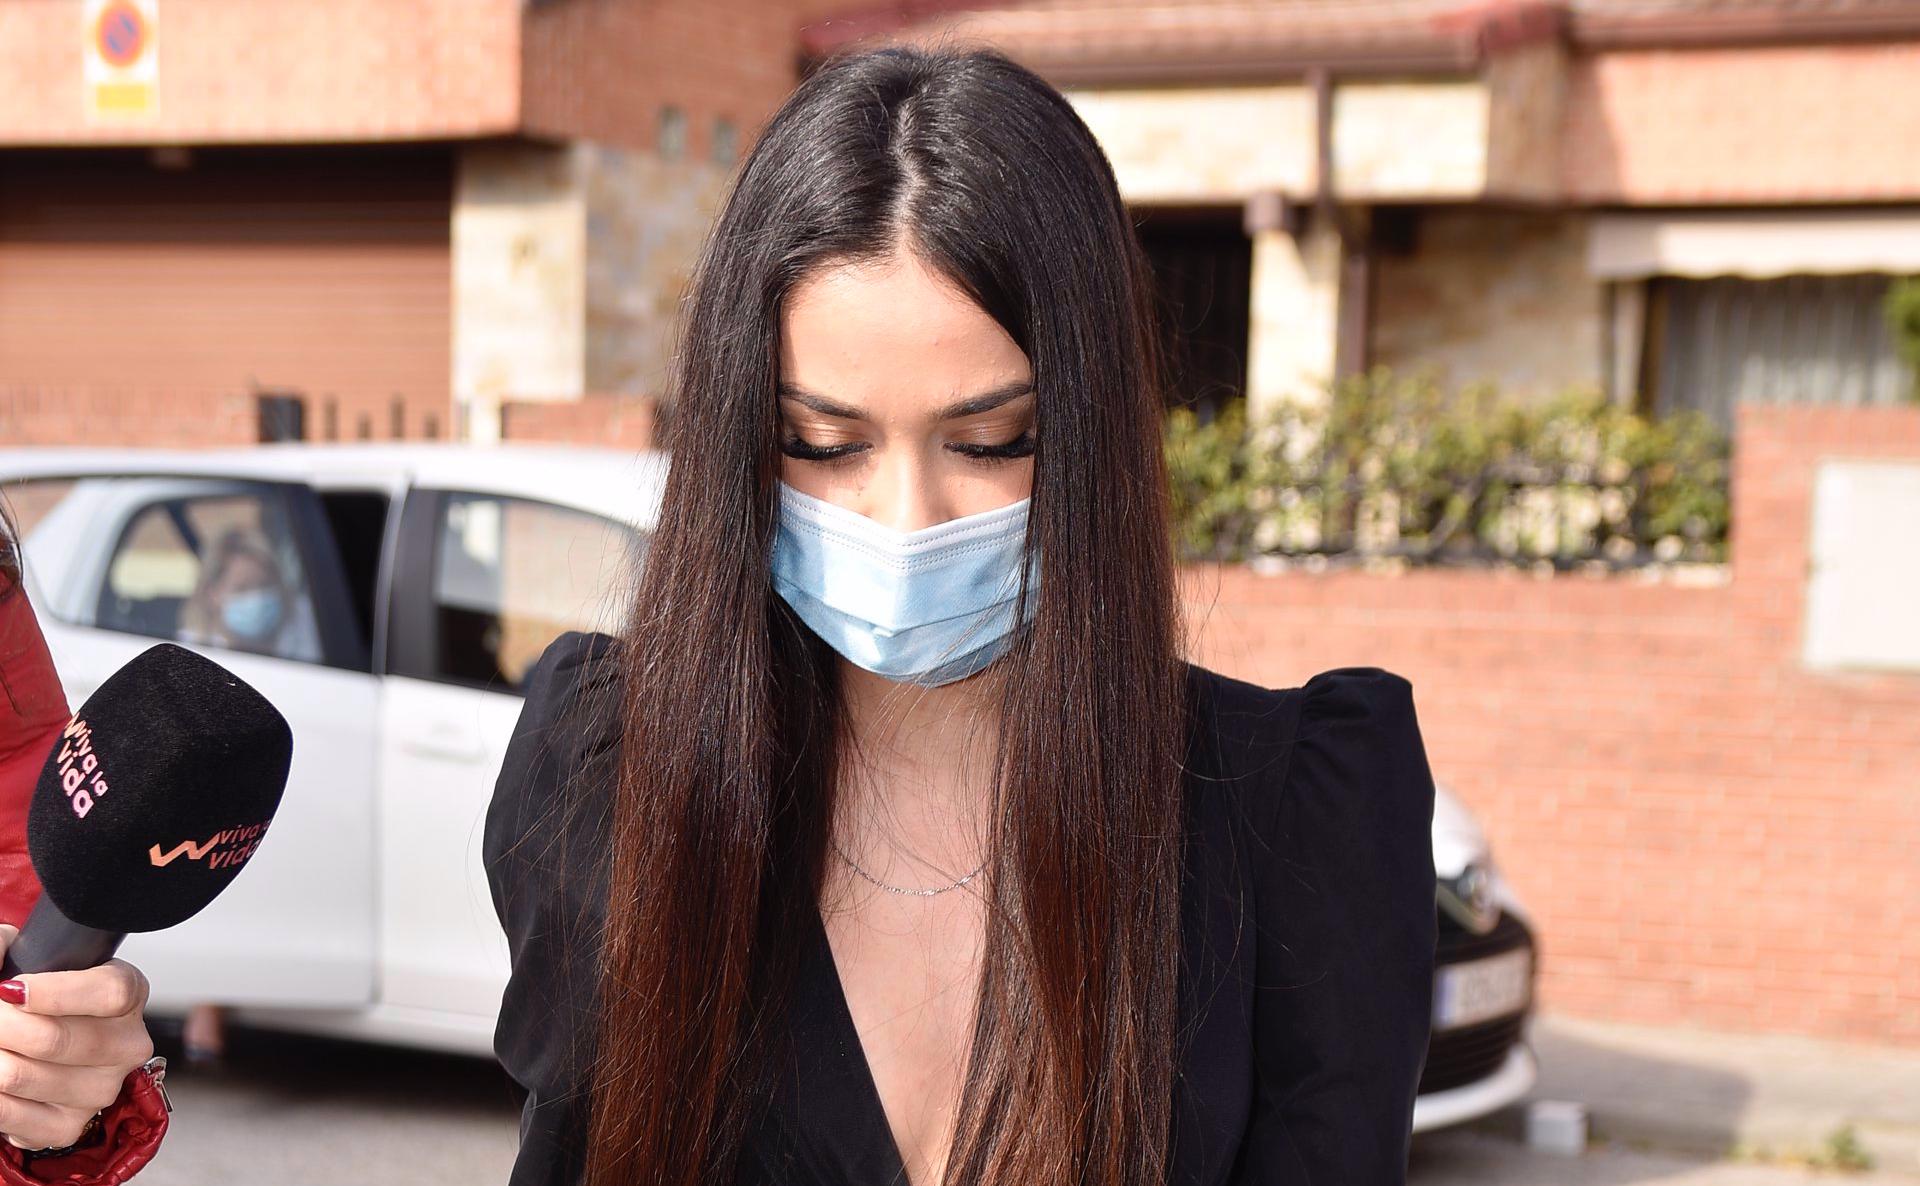 Julia Janeiro, enxampada pels 'paparazzi' - Europa Press